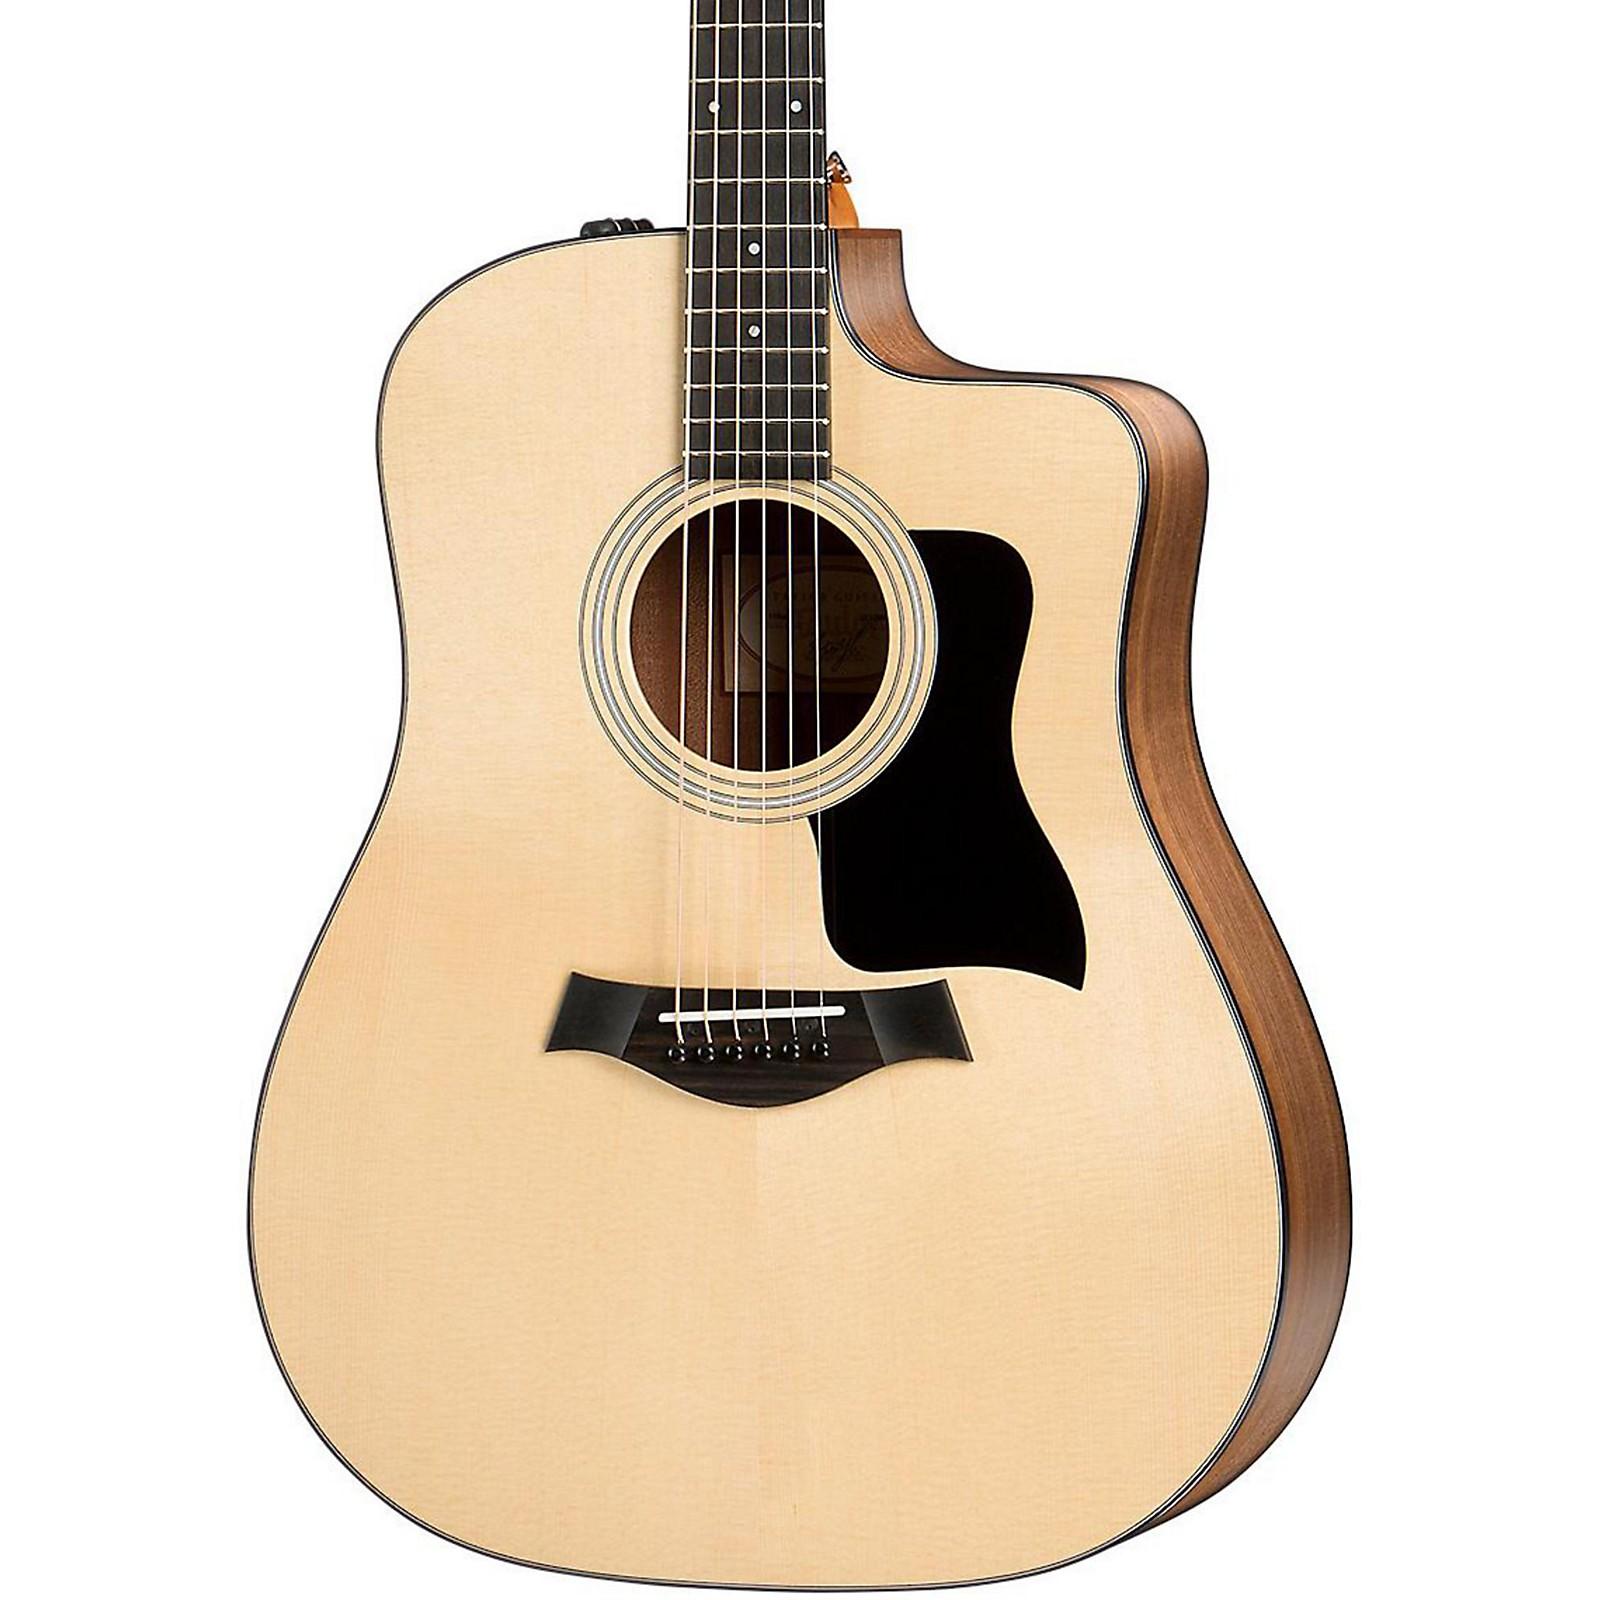 Taylor 110ce Dreadnought Acoustic-Electric Guitar